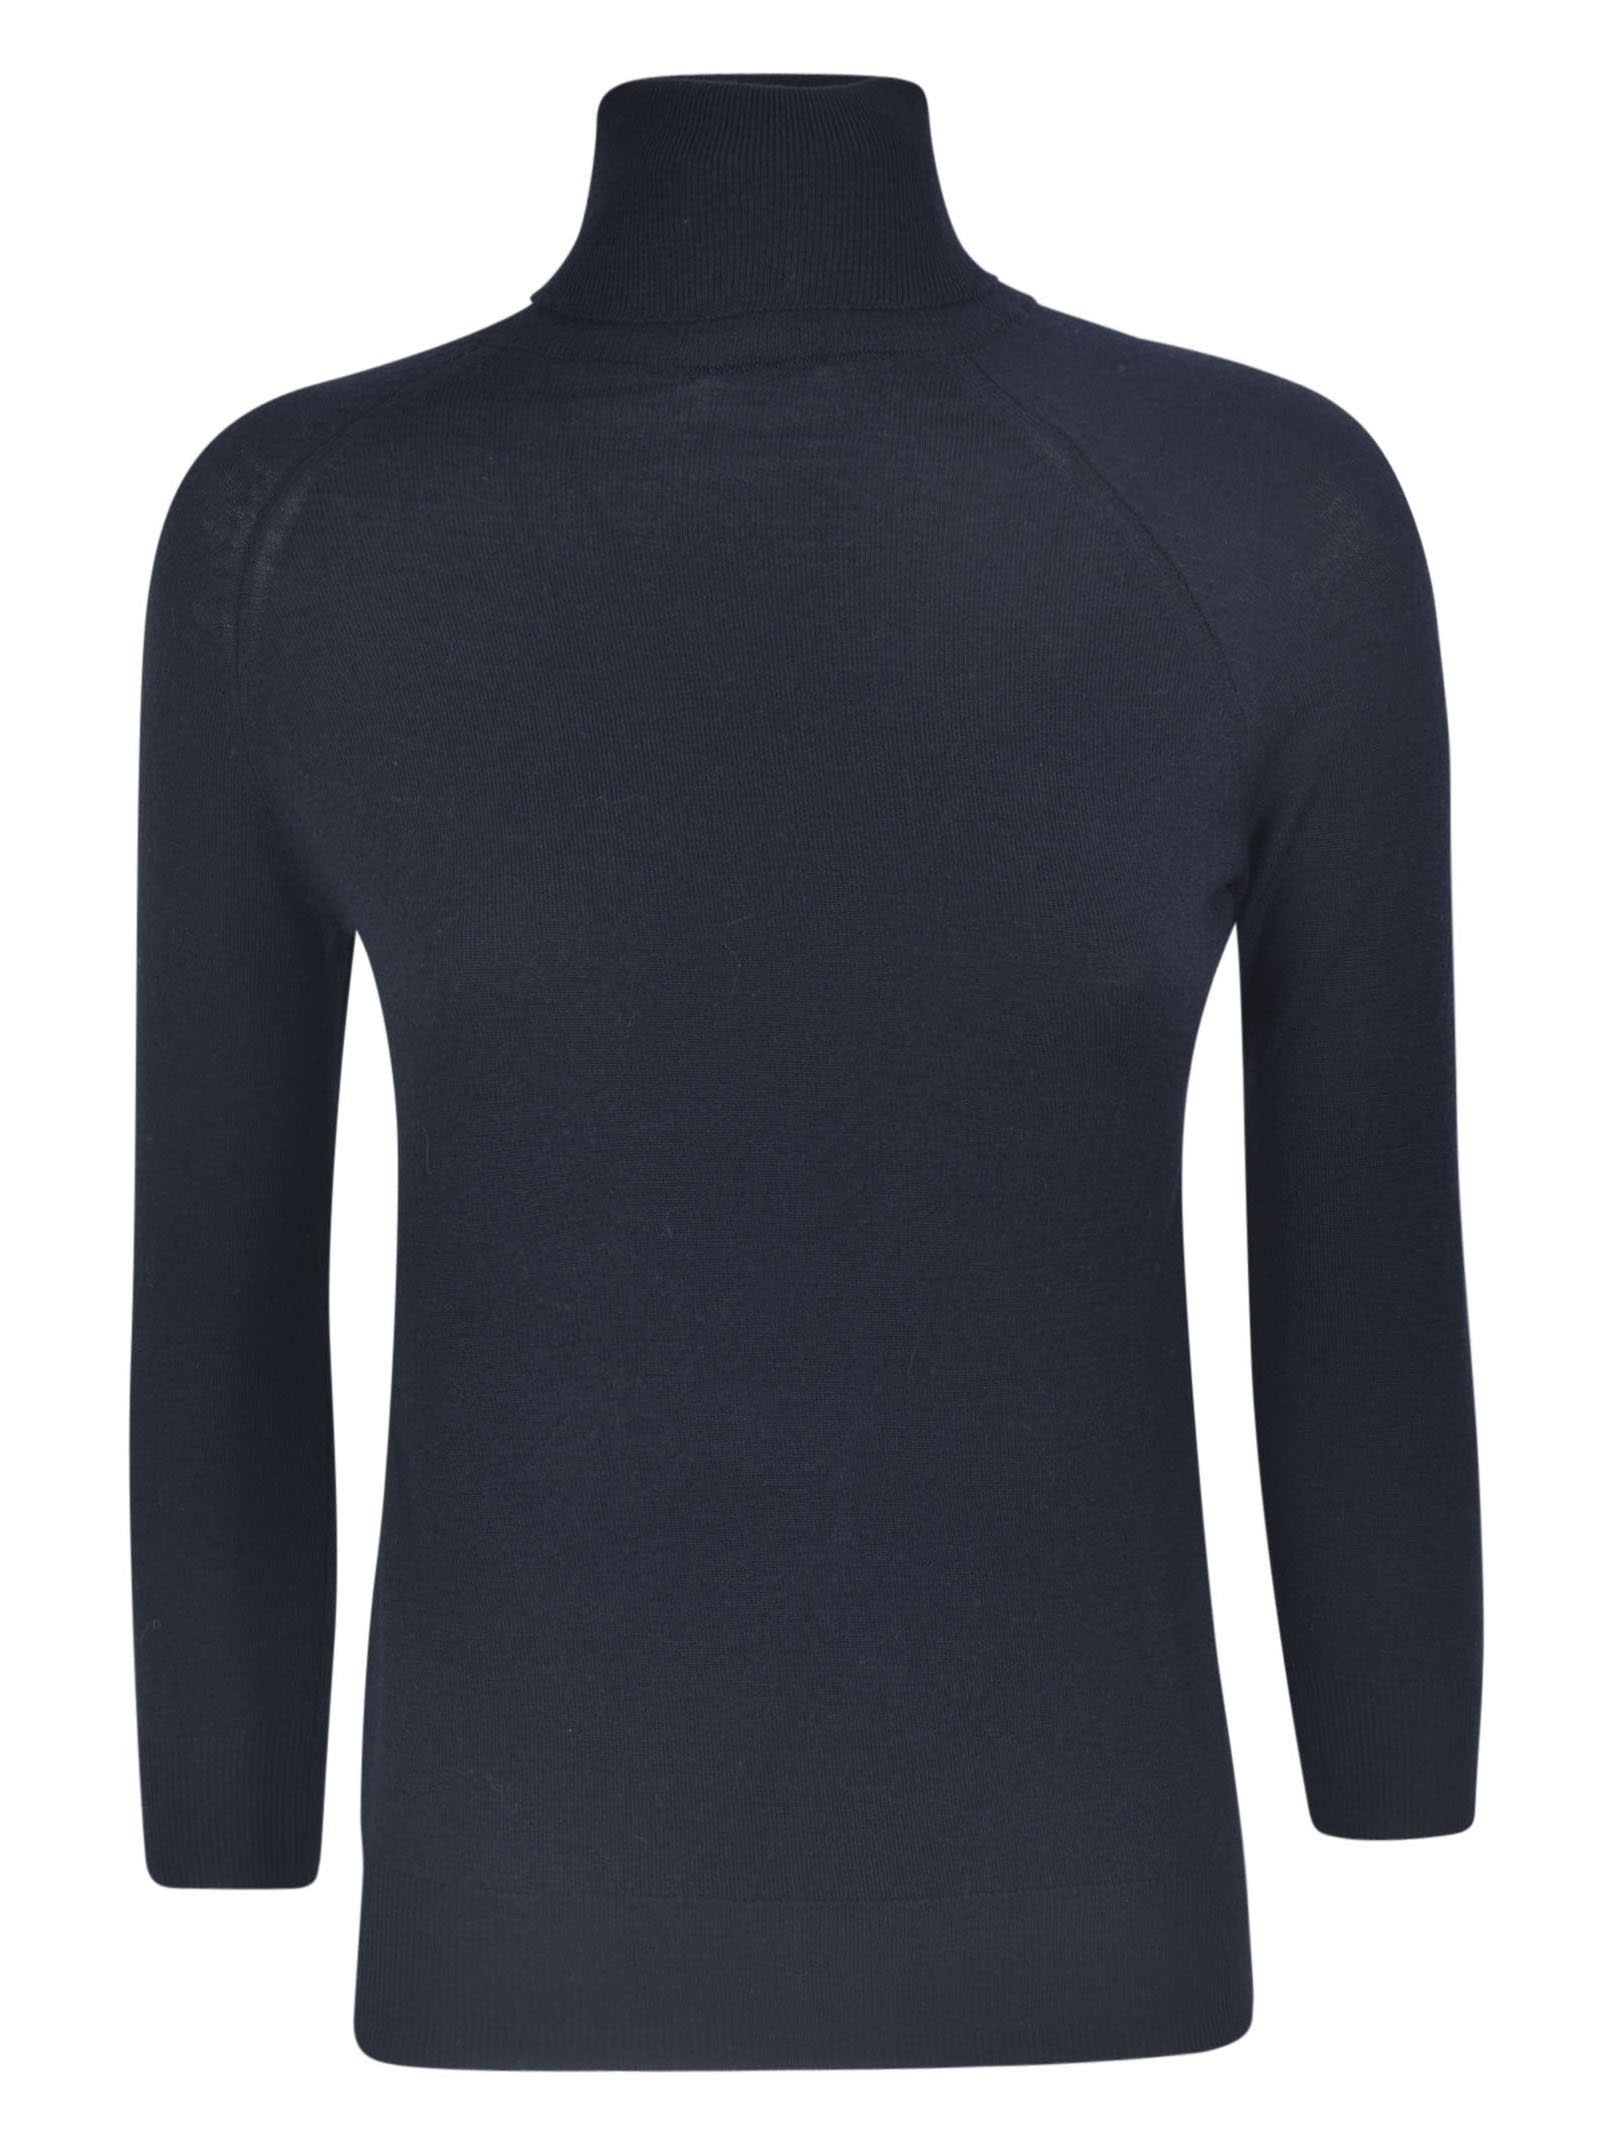 Turtleneck Classic Sweater